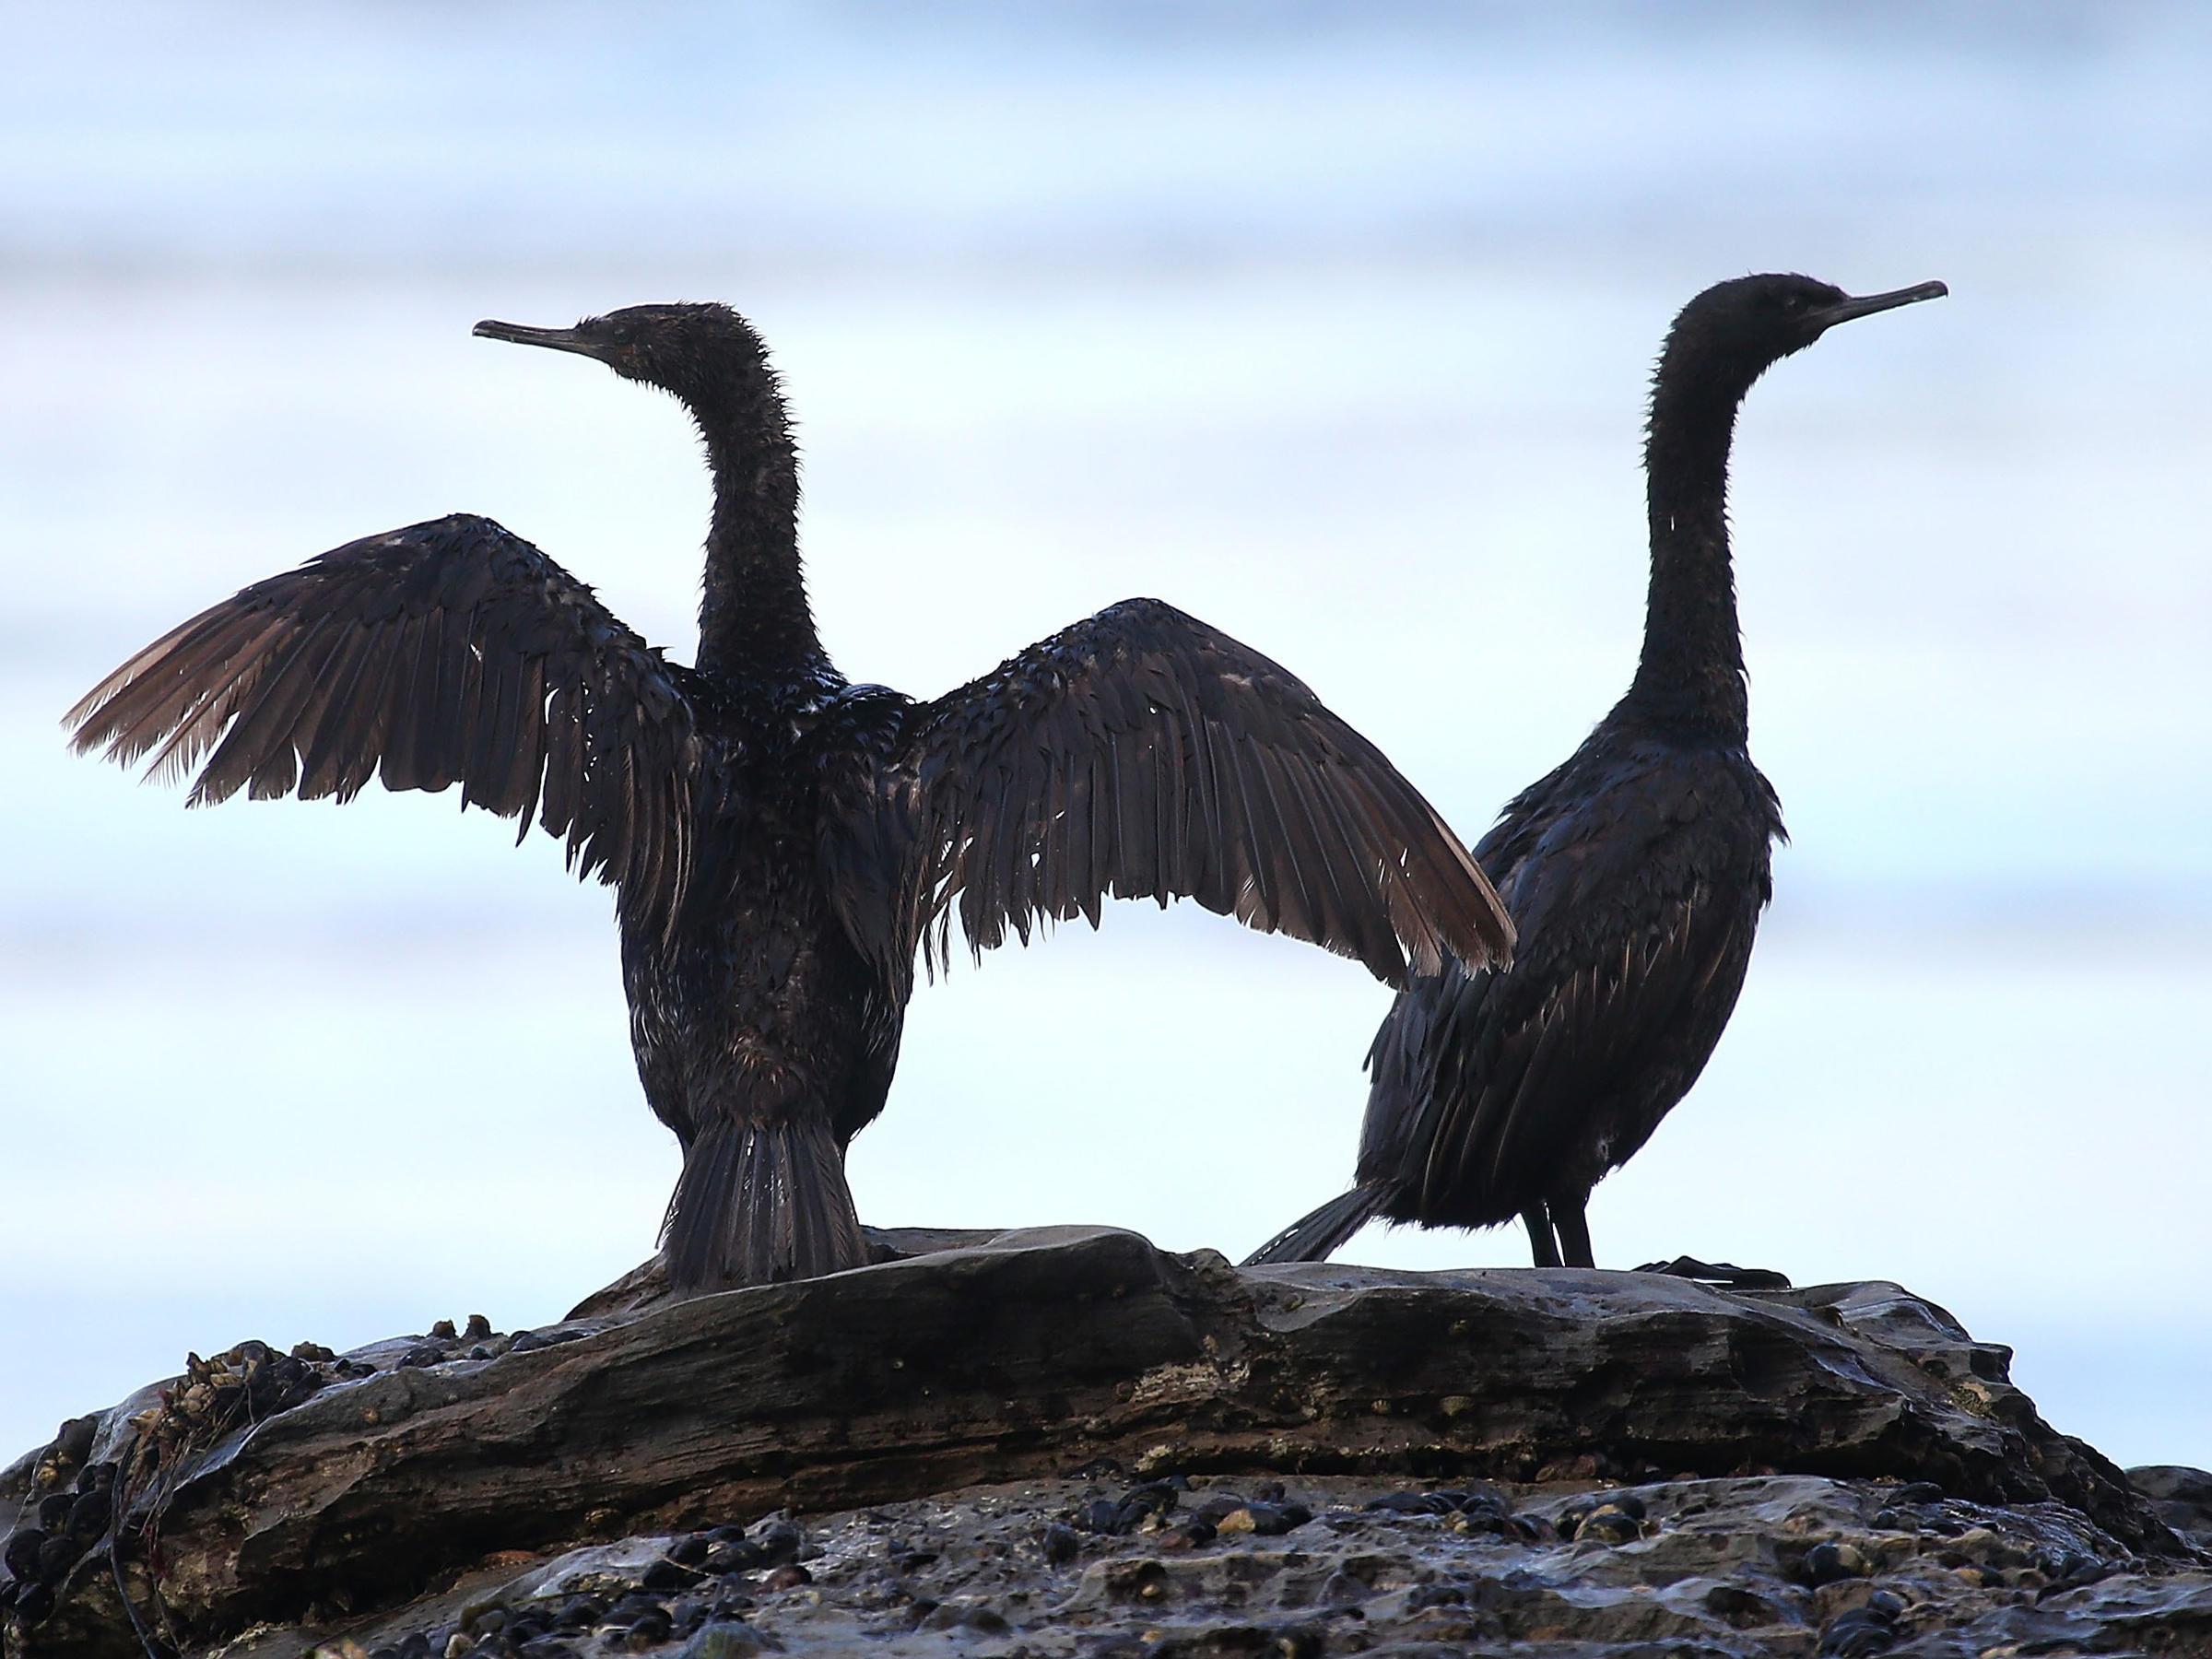 Accidentally Killing Birds Isn't A Crime, Says Trump